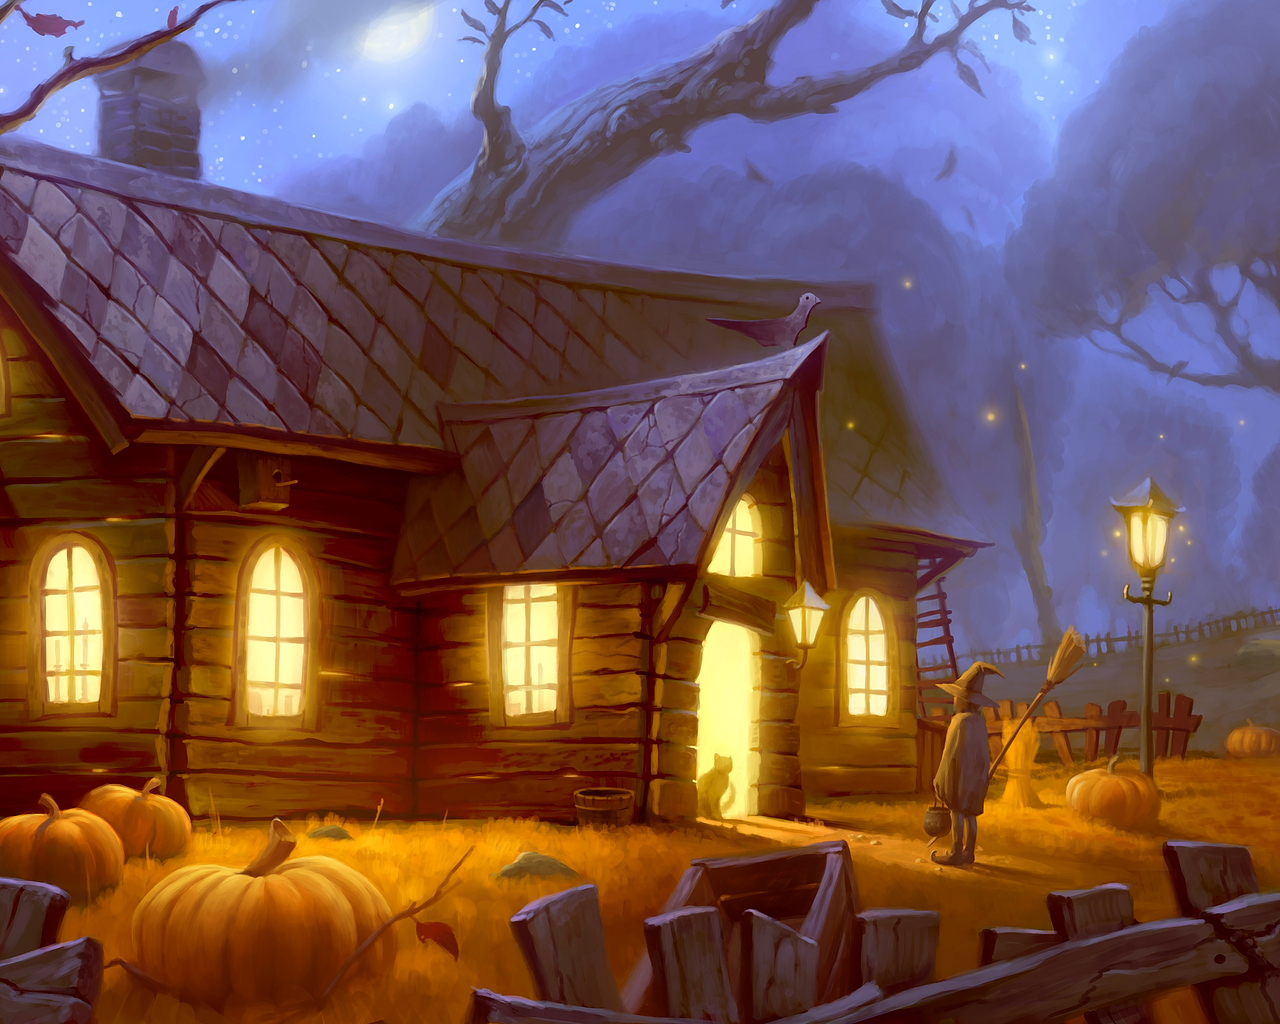 http://4.bp.blogspot.com/-x6sXyJV7TYE/UHbjBENLg9I/AAAAAAAAHOM/CSV89yFYXU8/s1600/Free+Halloween+Desktop+Wallpaper+001.jpg